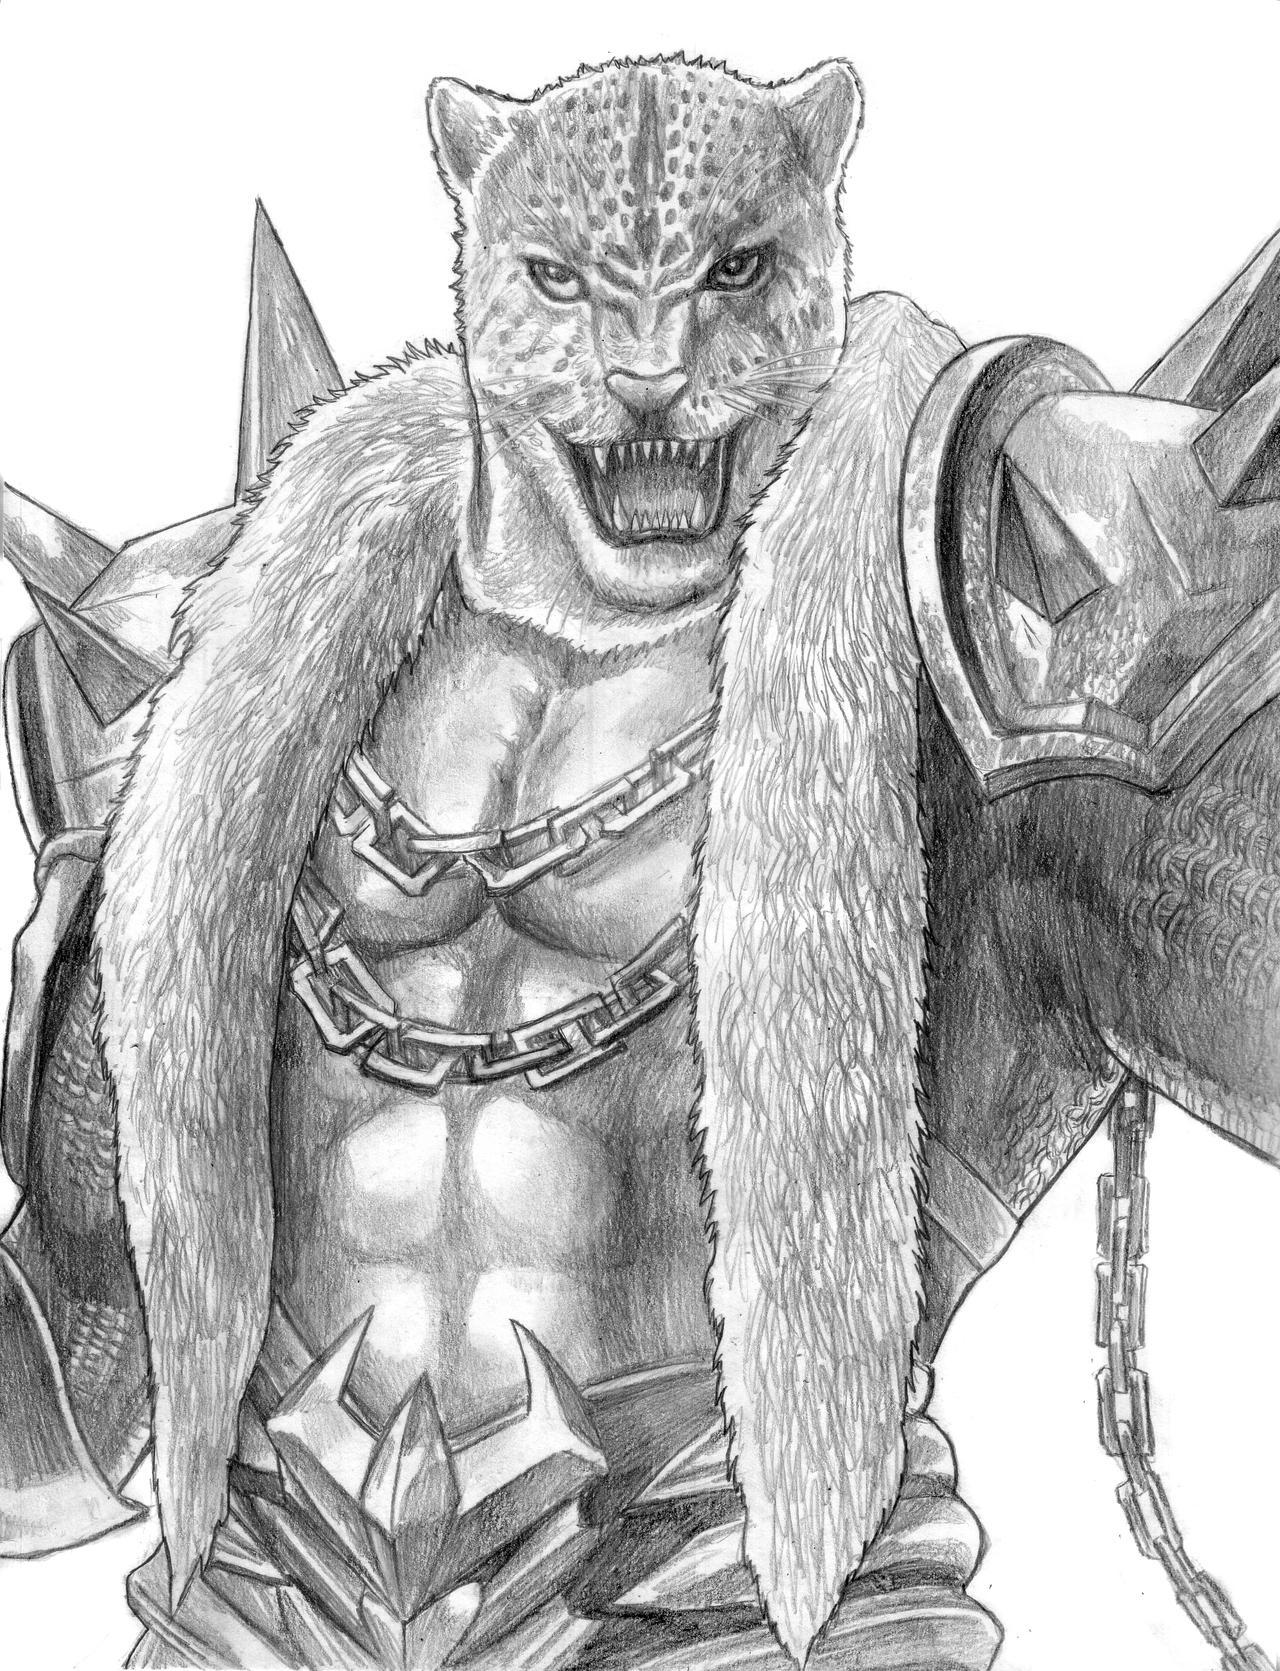 Armor King Tekken 7 By Soulstryder210 On Deviantart